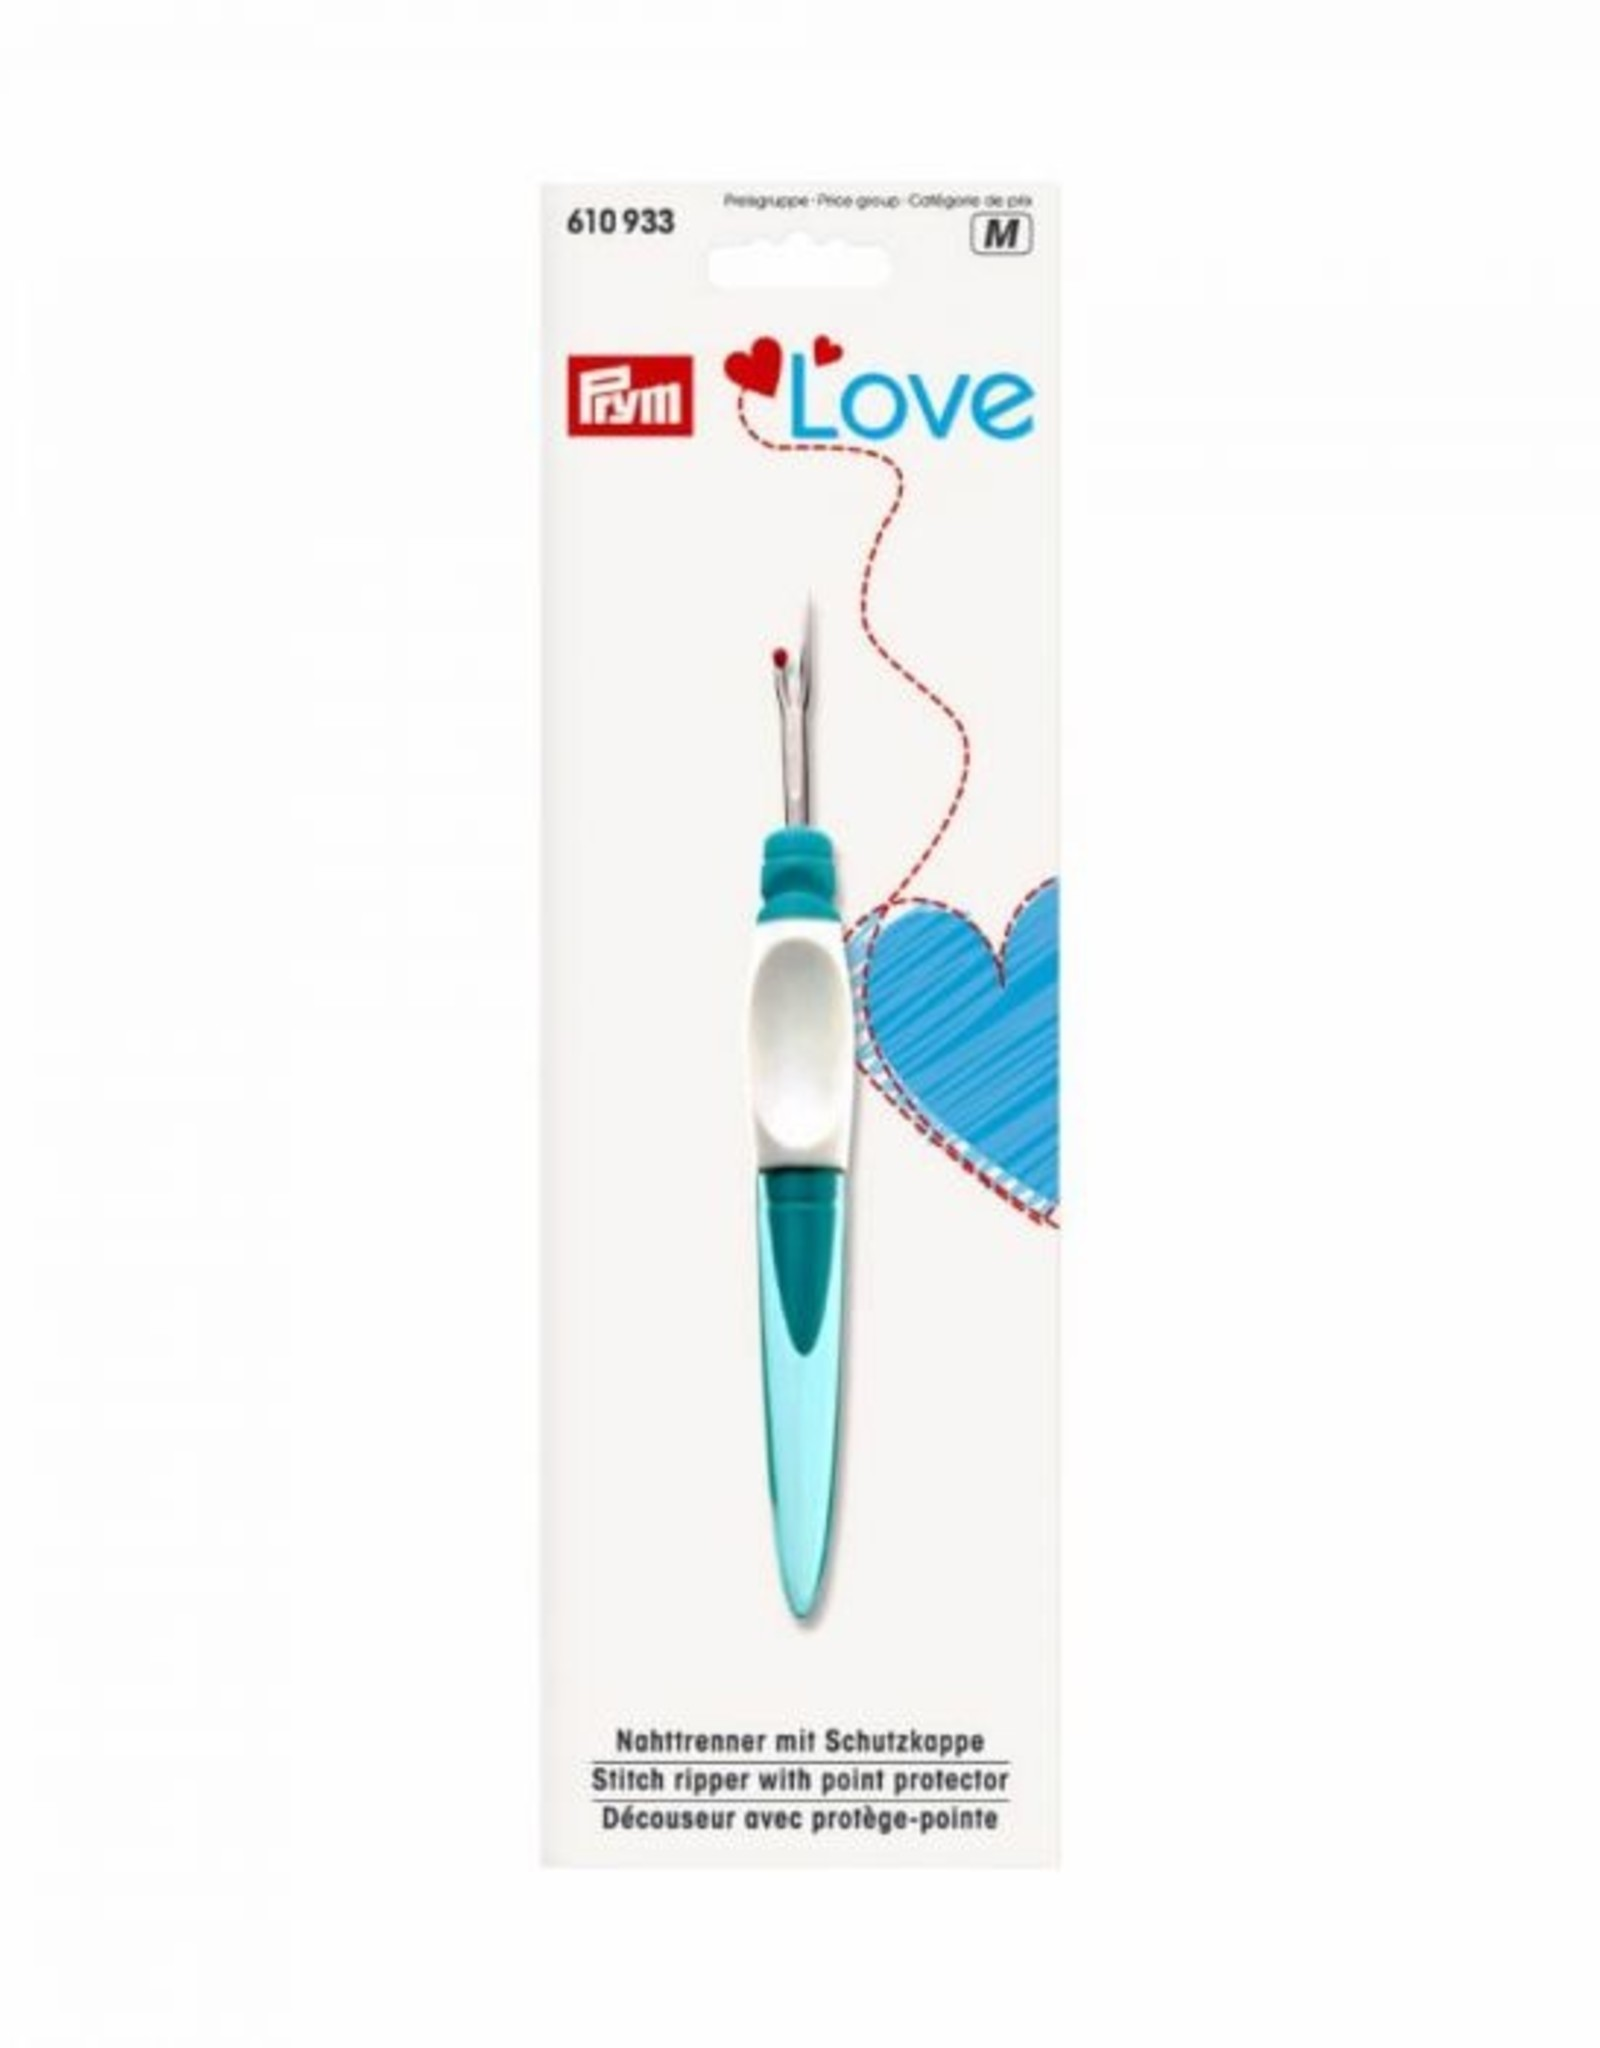 Prym Prym - Love tornmesje met beschermkapje - 610 933